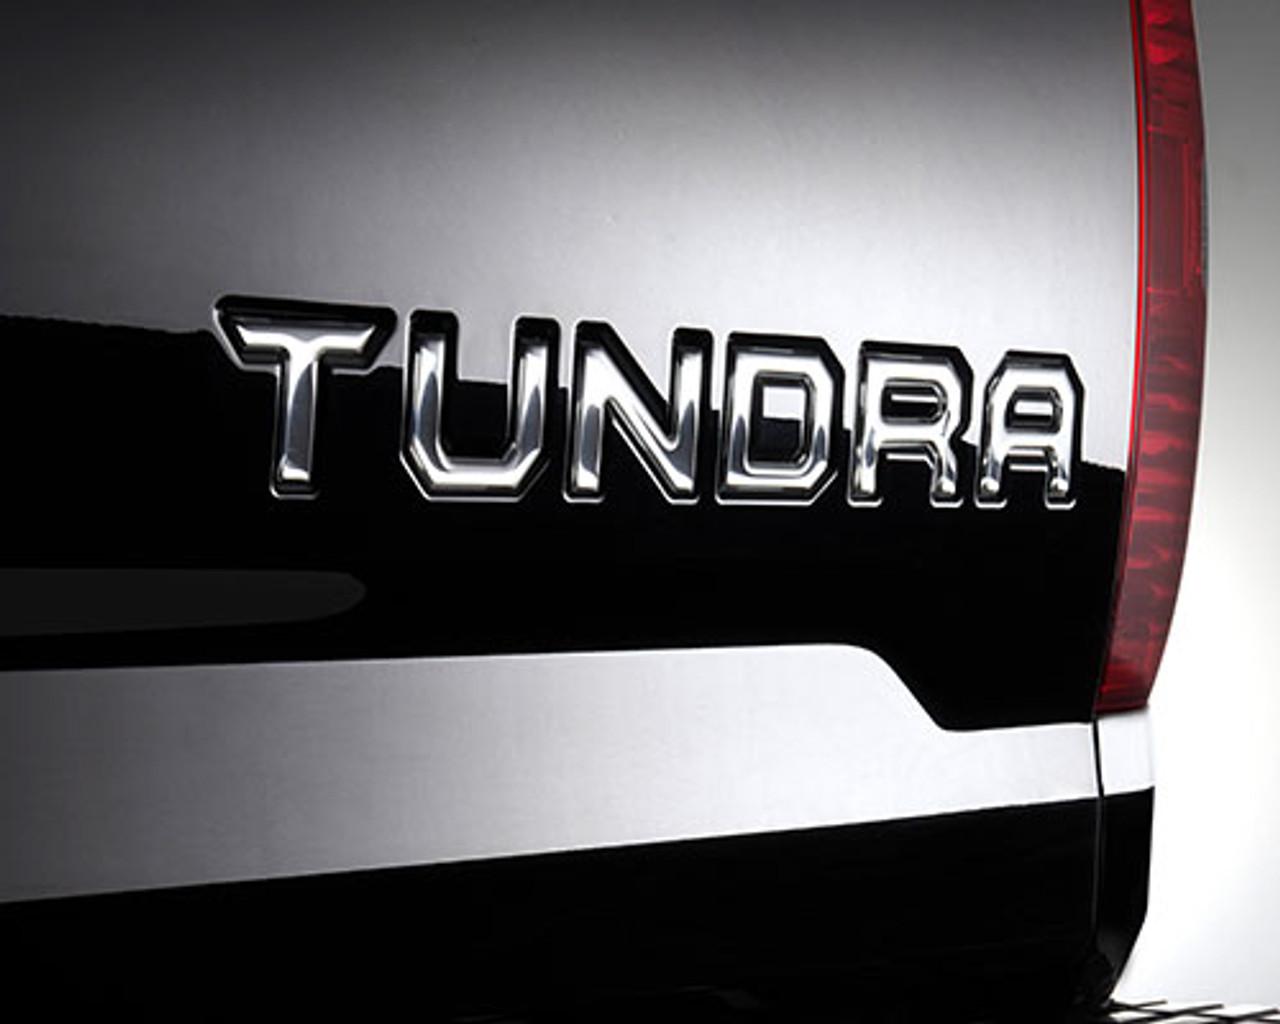 Tundra Tailgate Insert Badge - Chrome (PT948-34150-10)